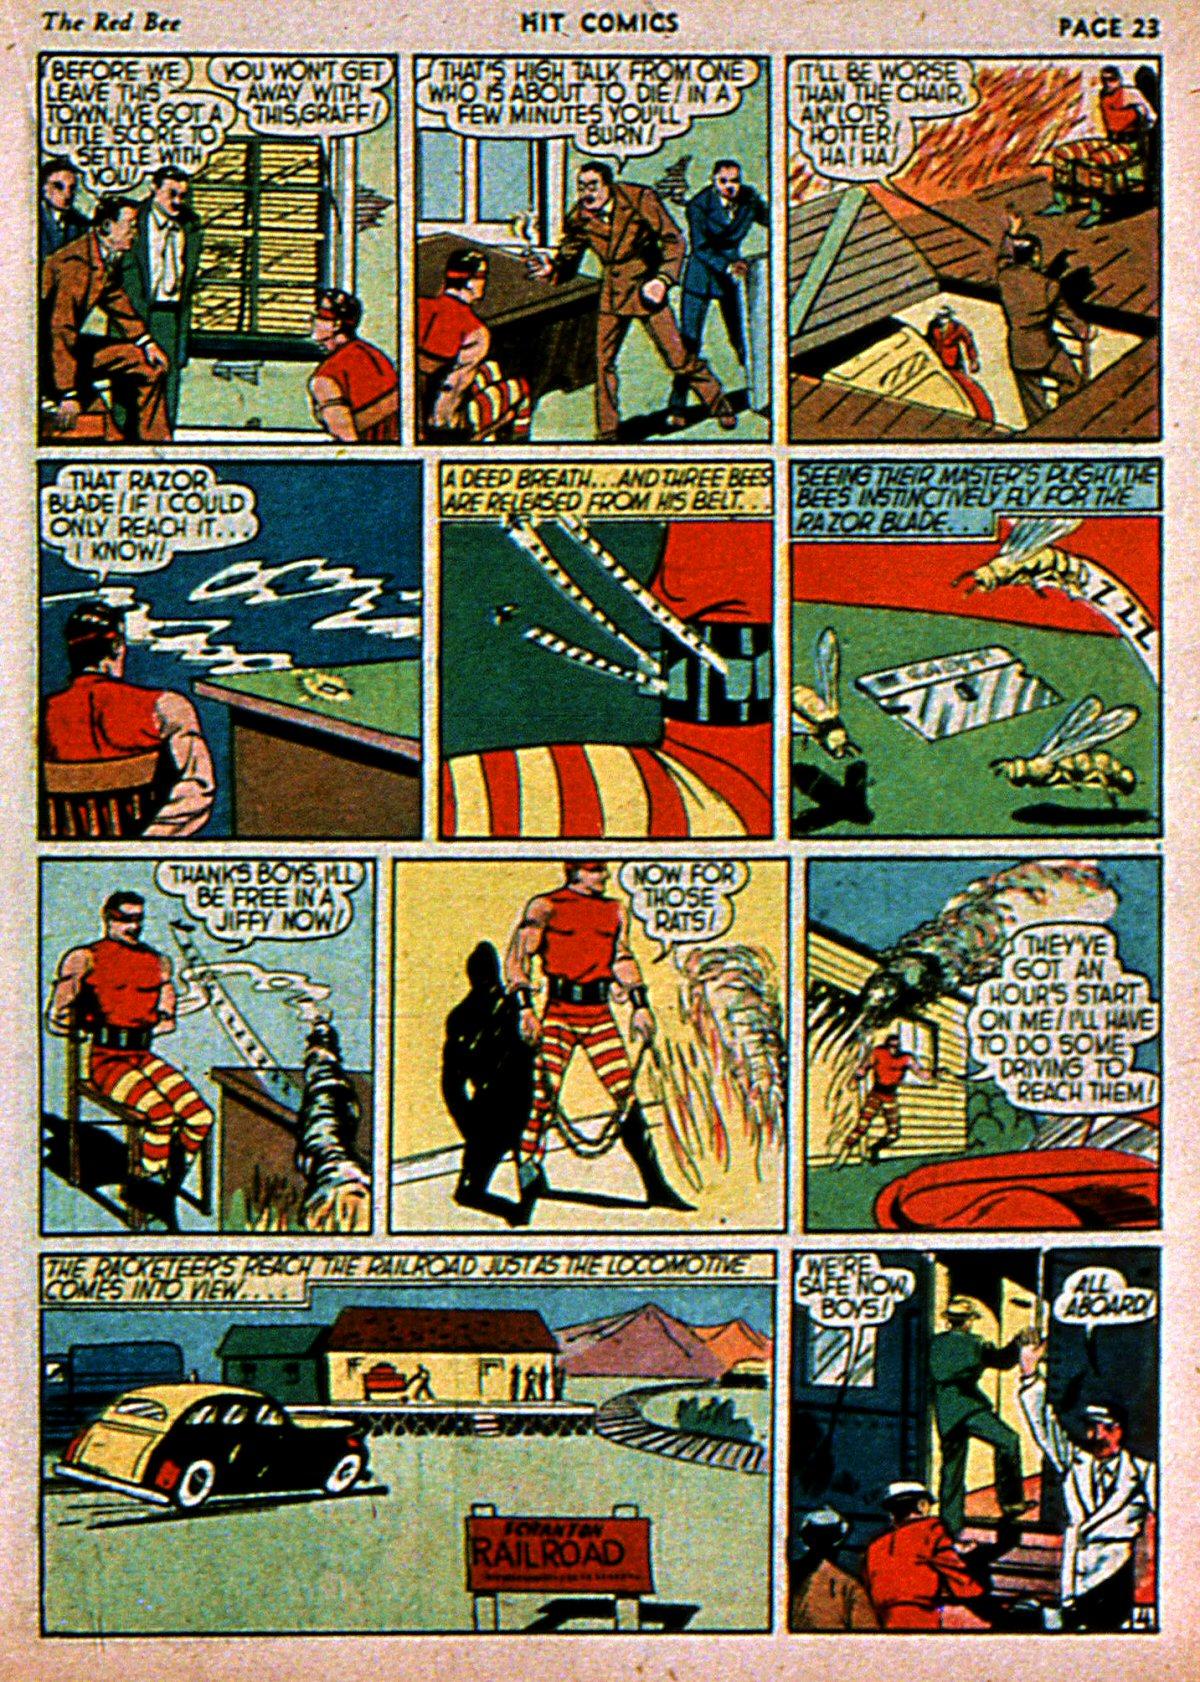 Read online Hit Comics comic -  Issue #3 - 25